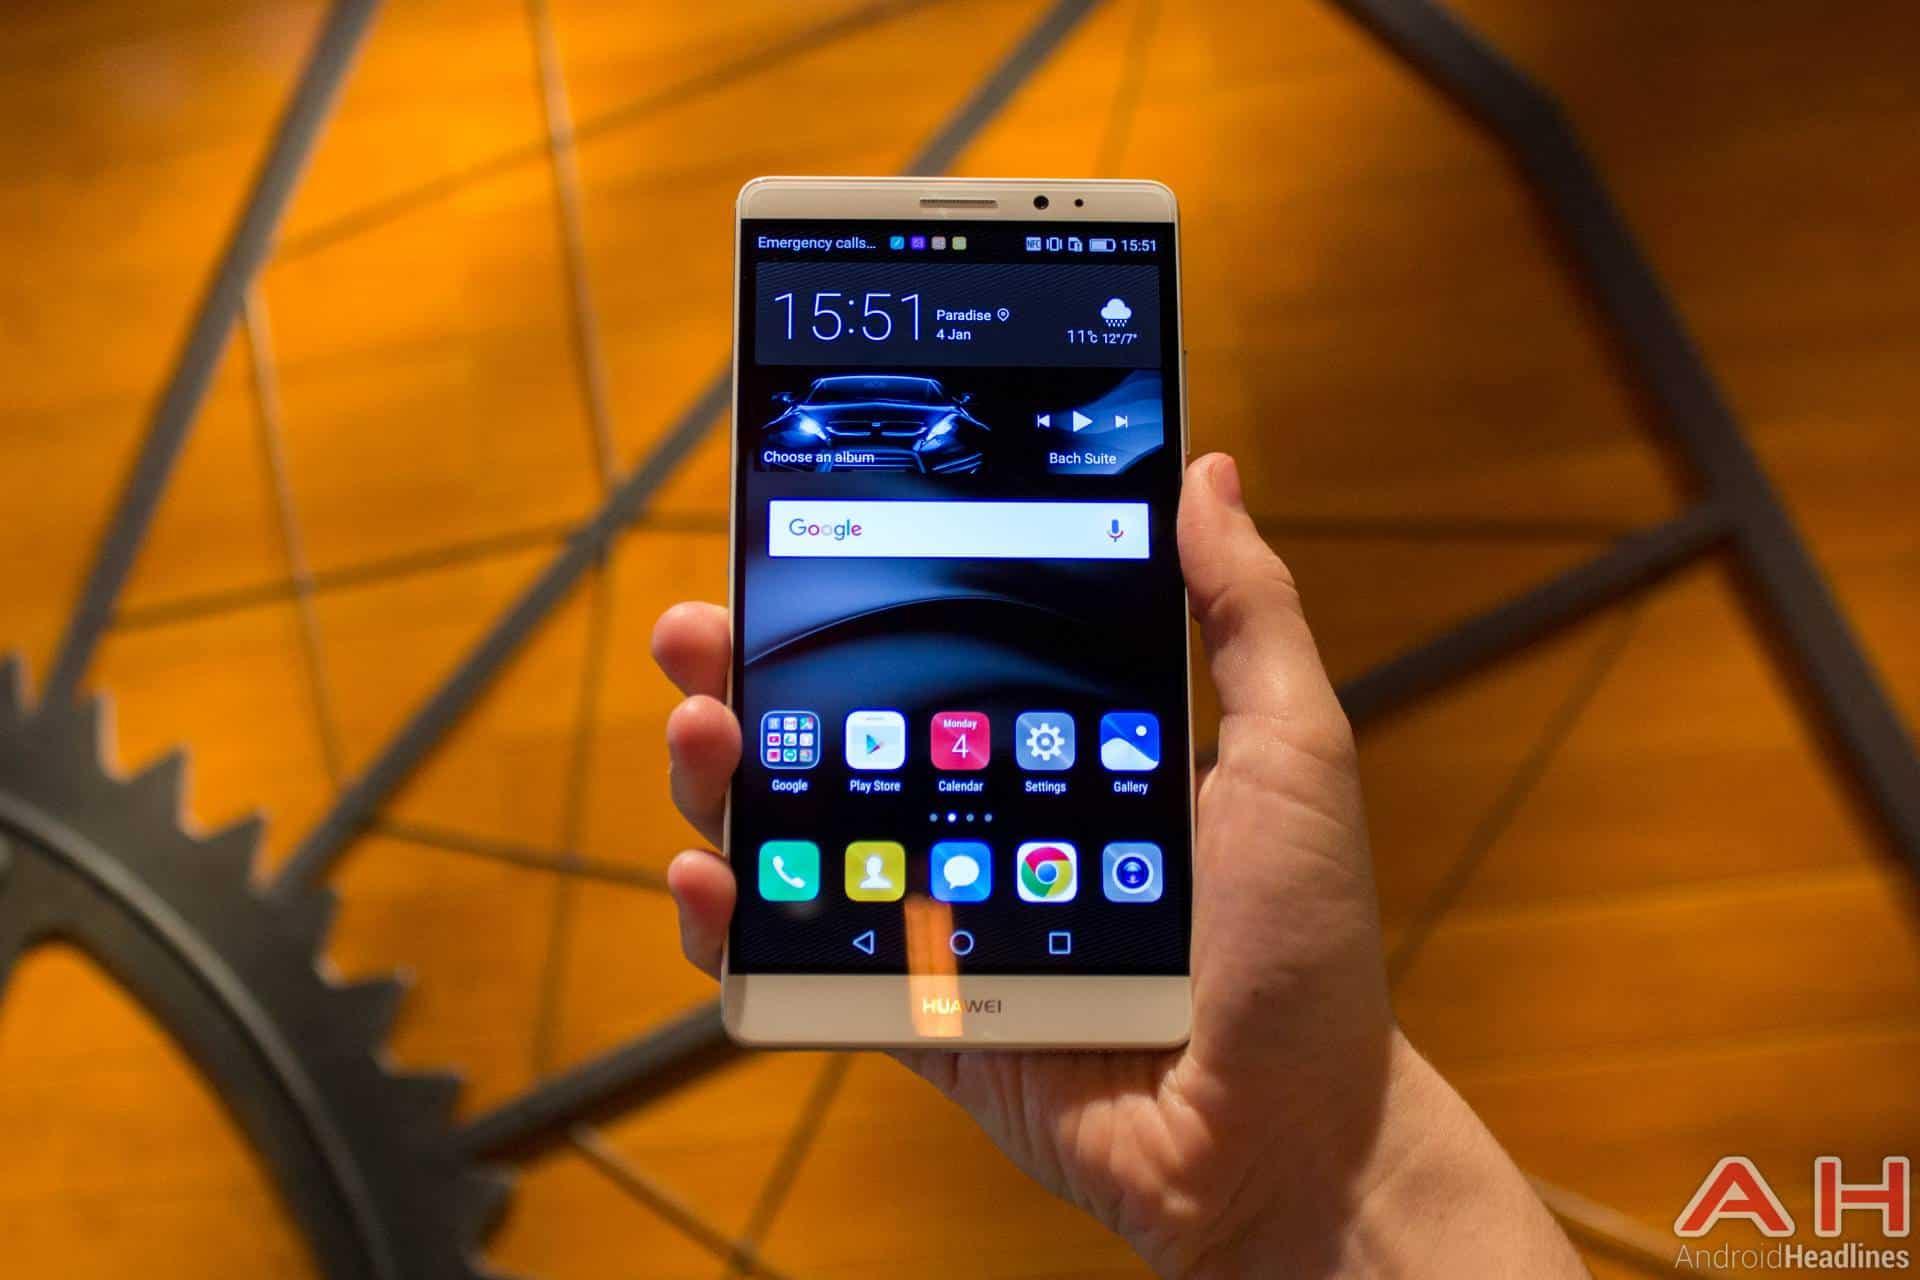 Huawei Mate 8 CES 2016 AH 18